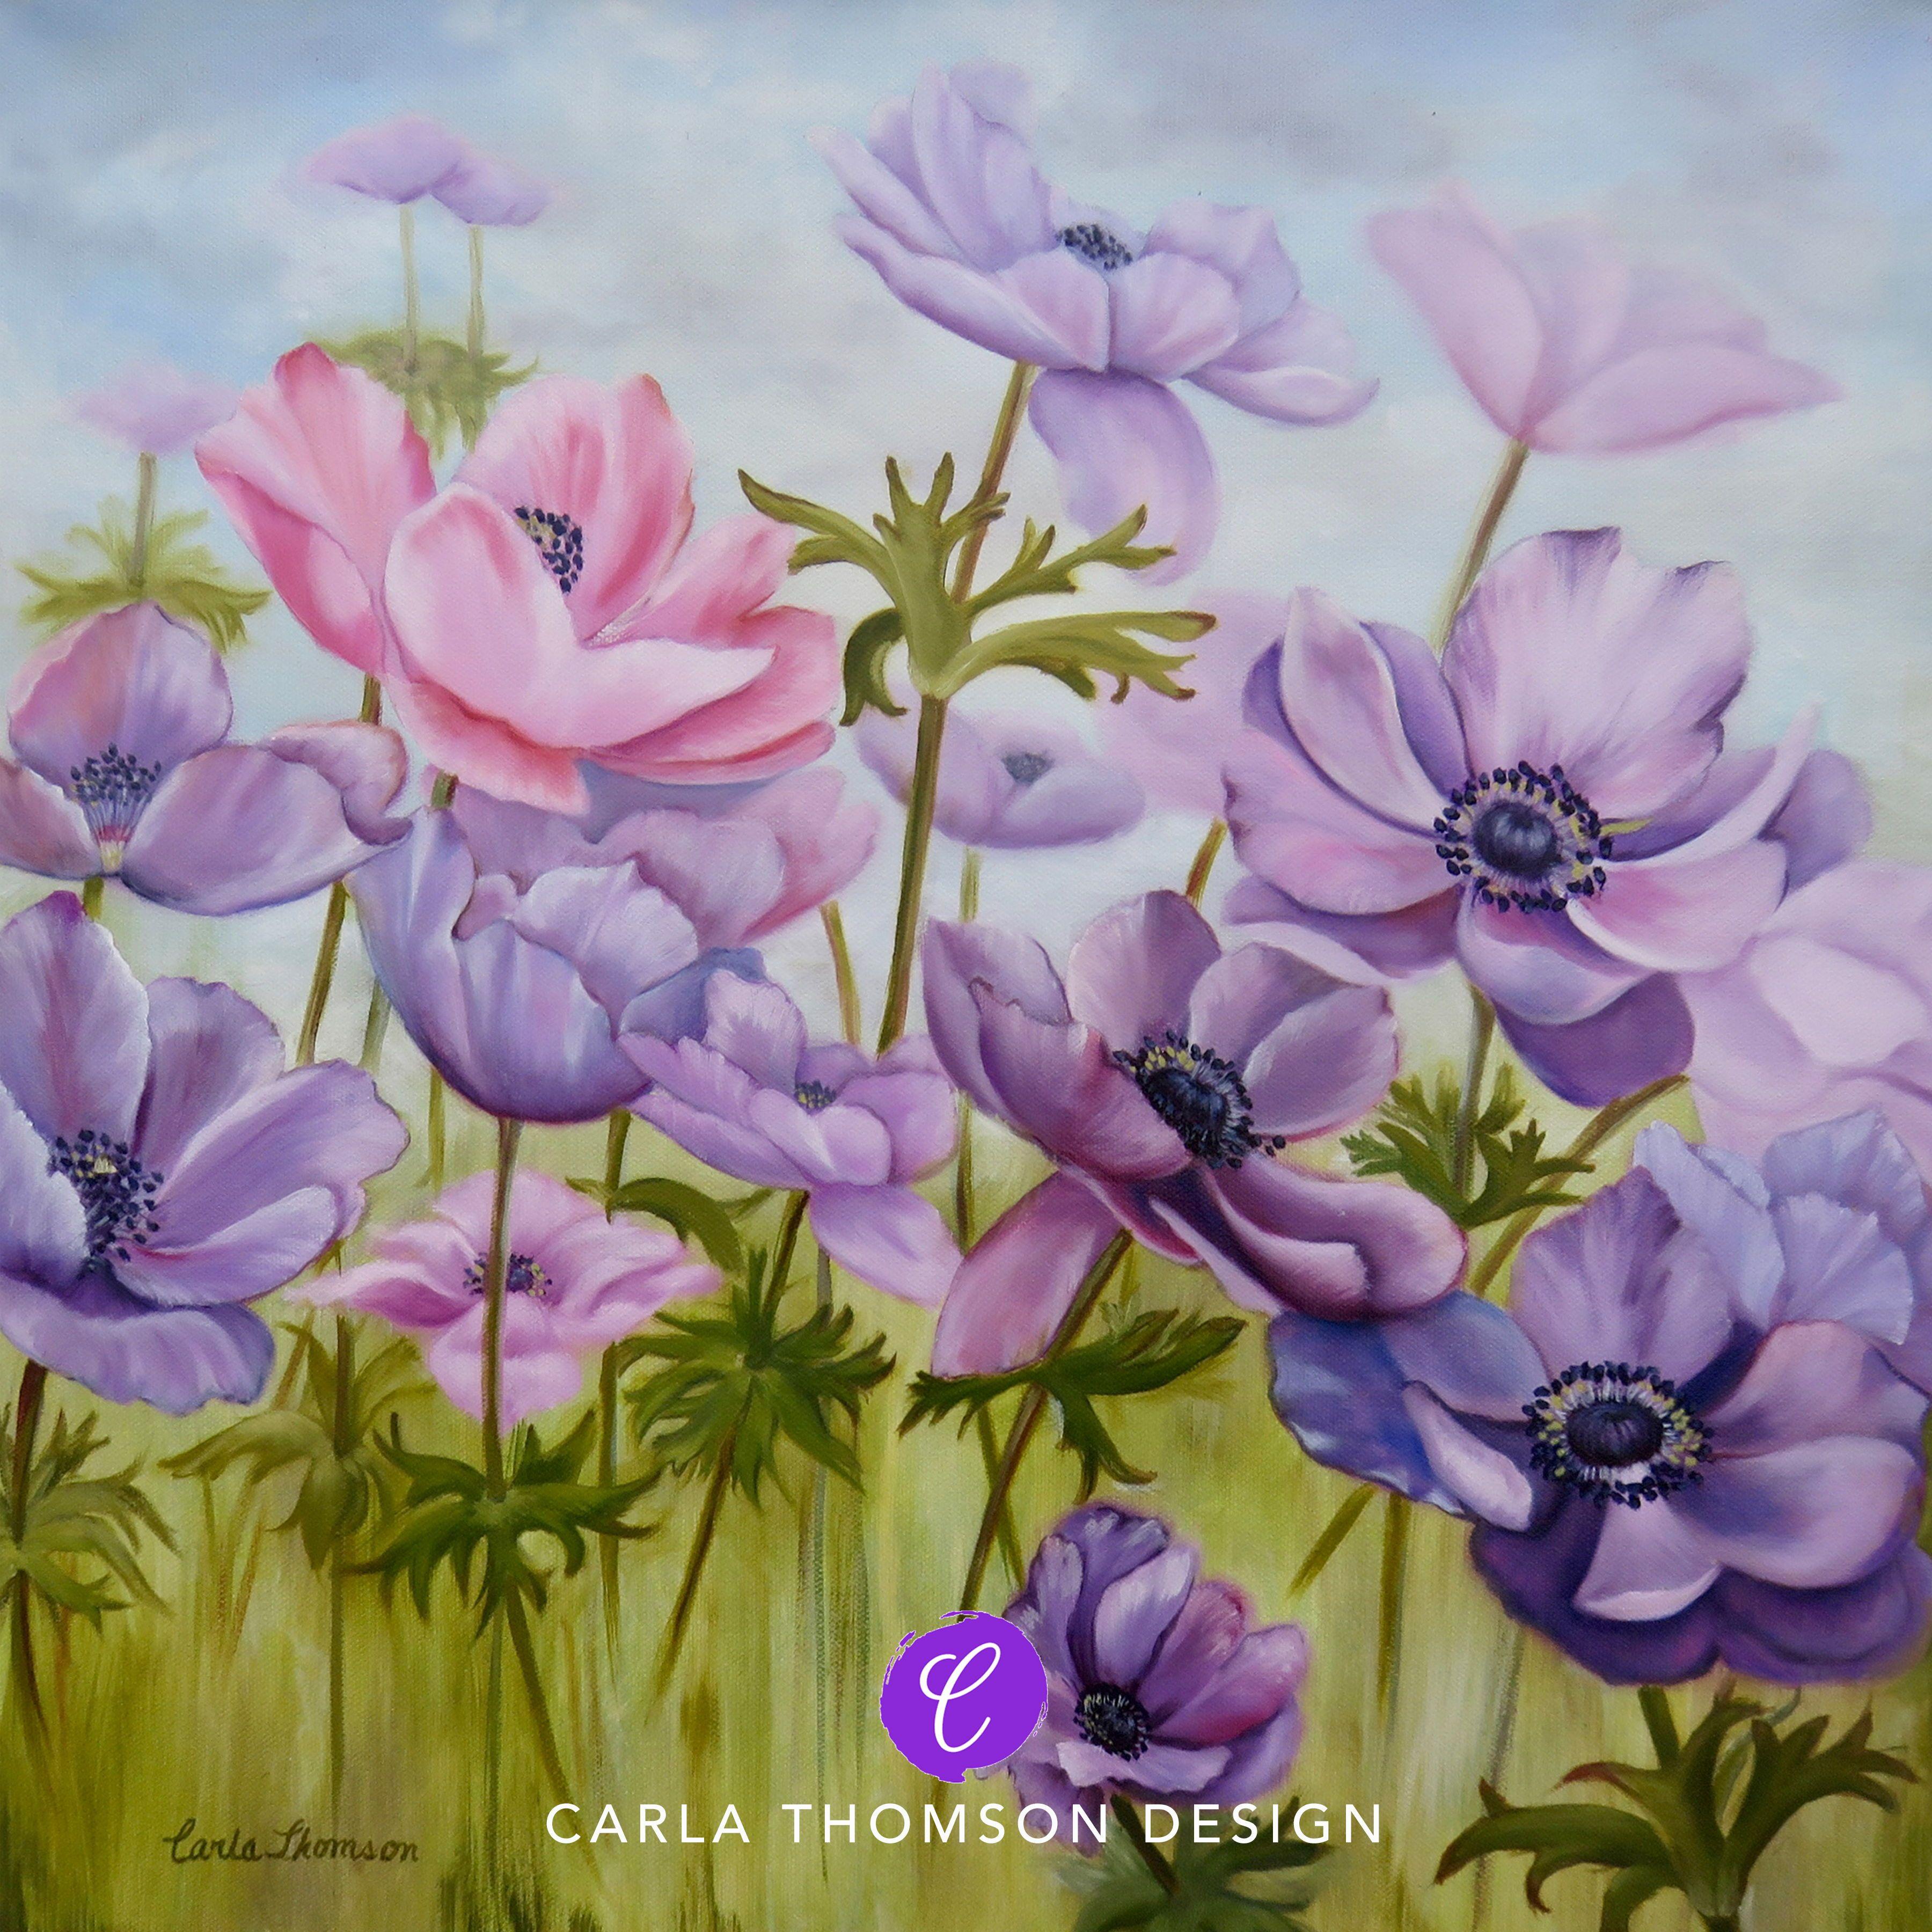 Field Of Flowers Original Art Oil Painting On Canvas Purple Pink Anemone Flowers Painting Windflowers Shabby Chic De Painting Art Painting Oil Oil Painting